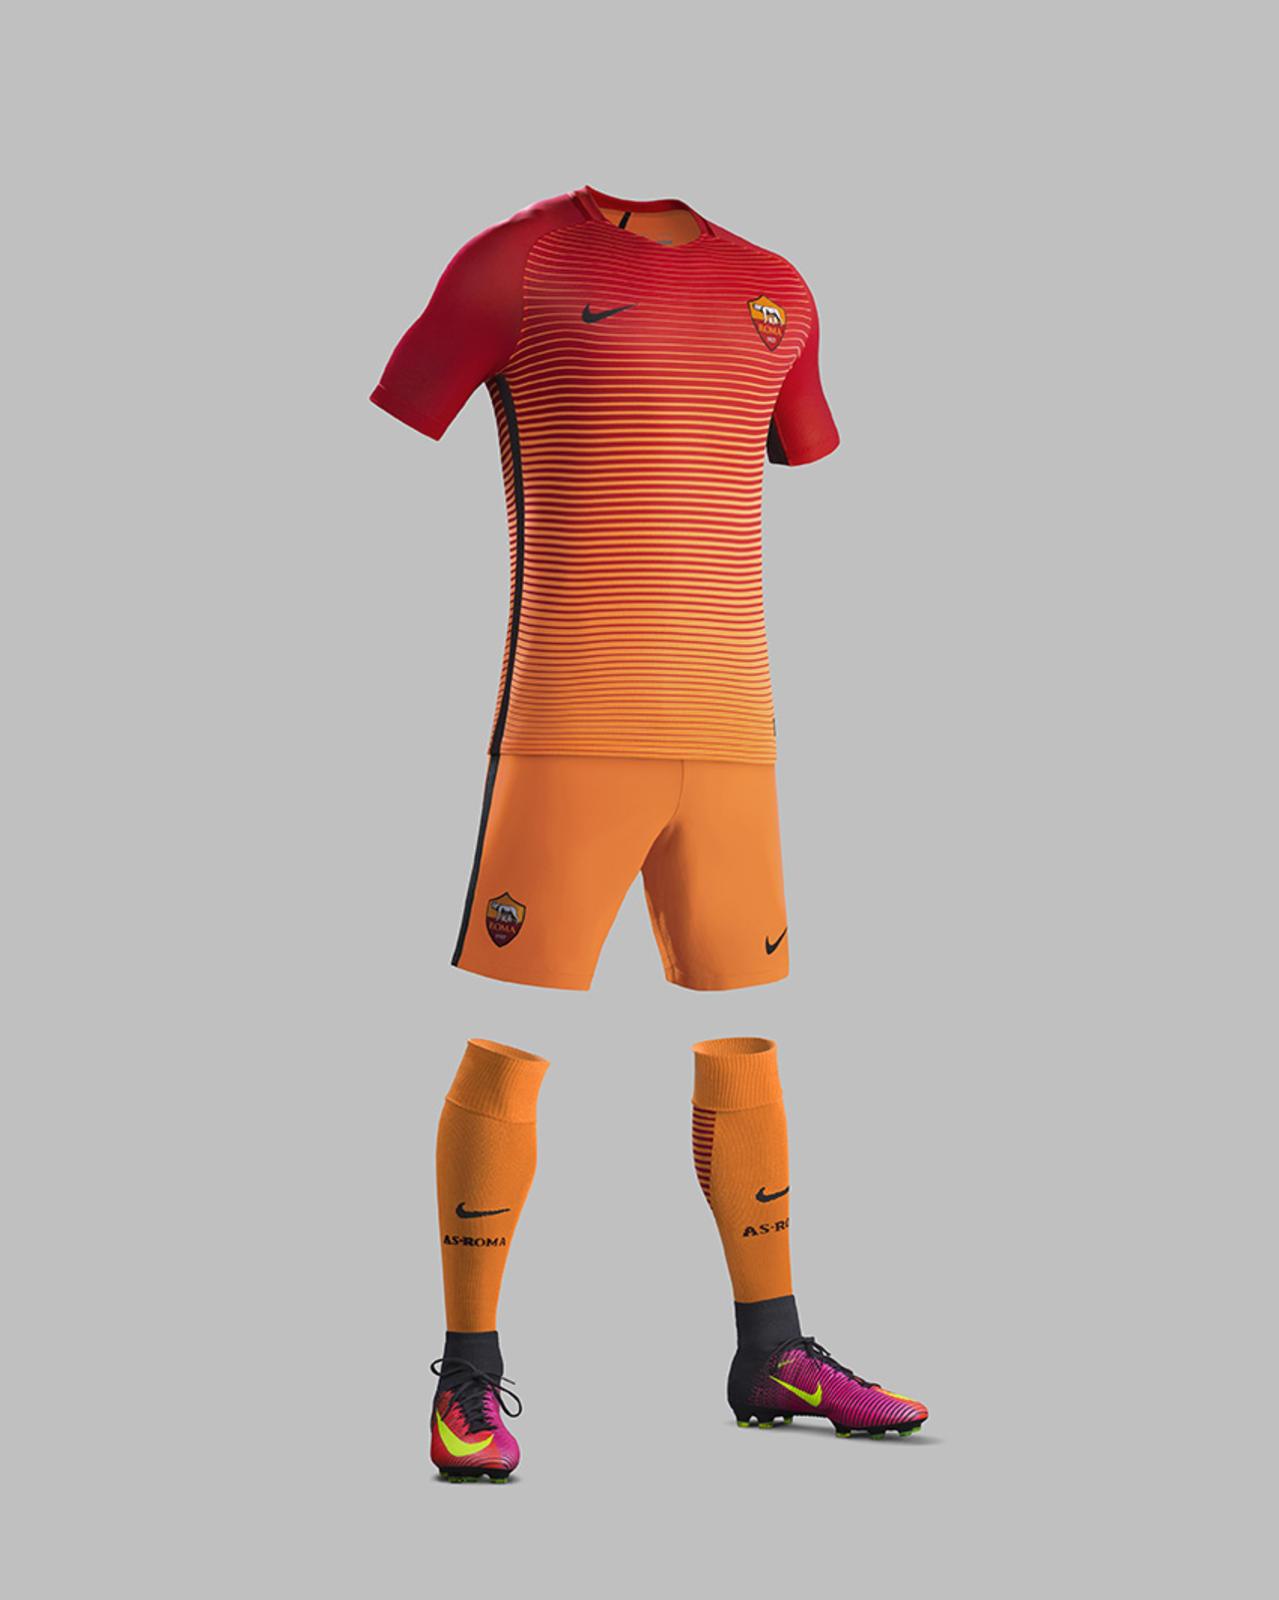 e8546bb82 AS Roma Third Kit Revealed